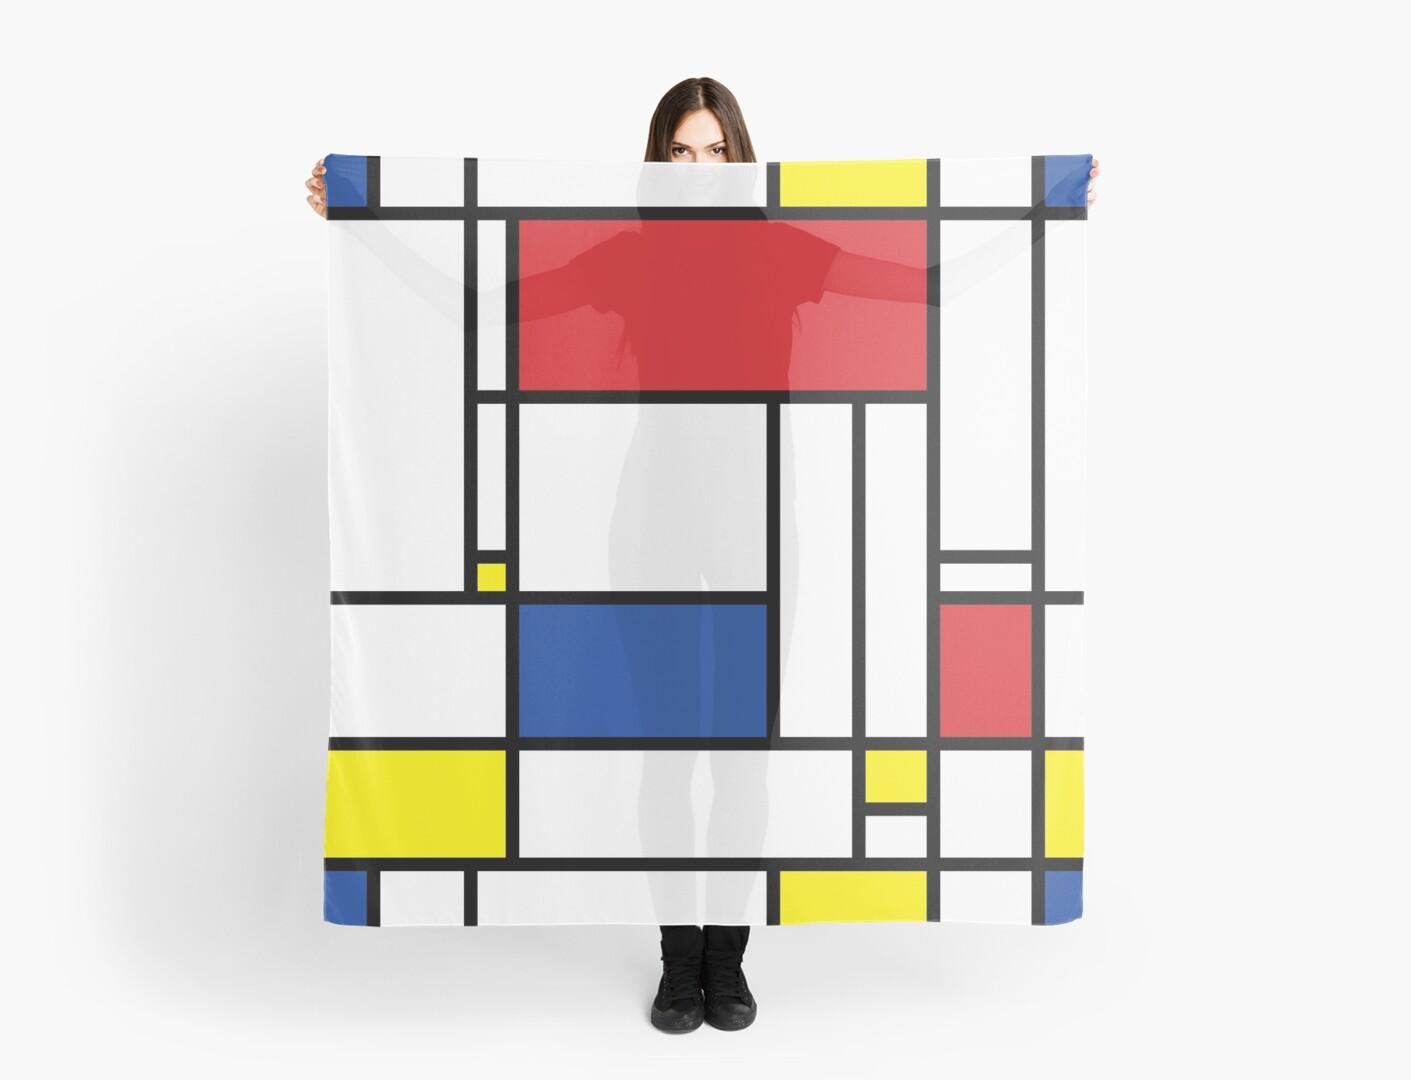 Mondrian Minimalist De Stijl Modern Art by fatfatin